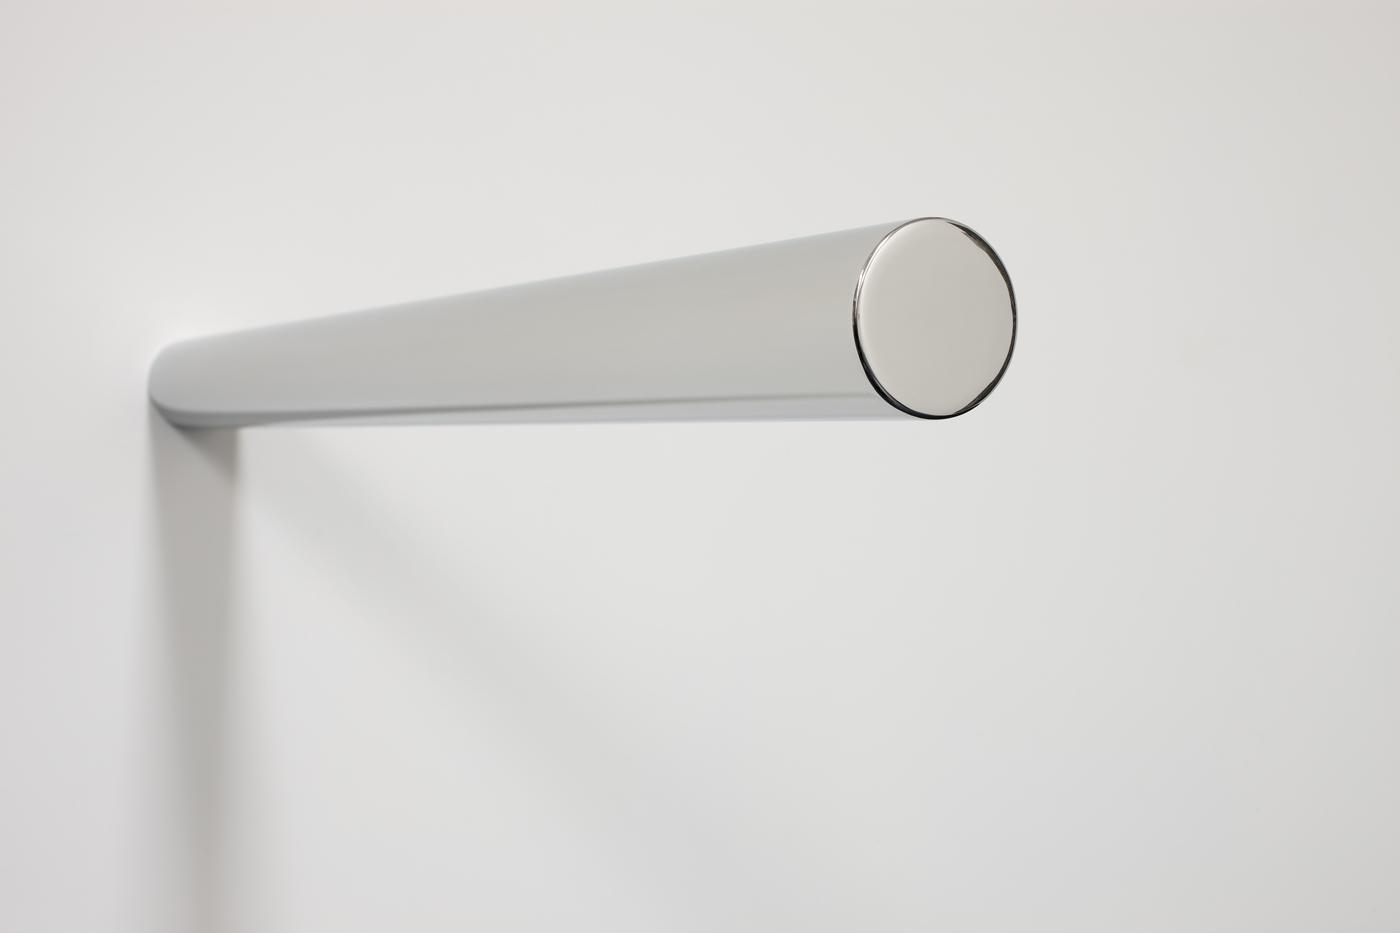 05. Lazaros - Silver Cord (Detail), 2014